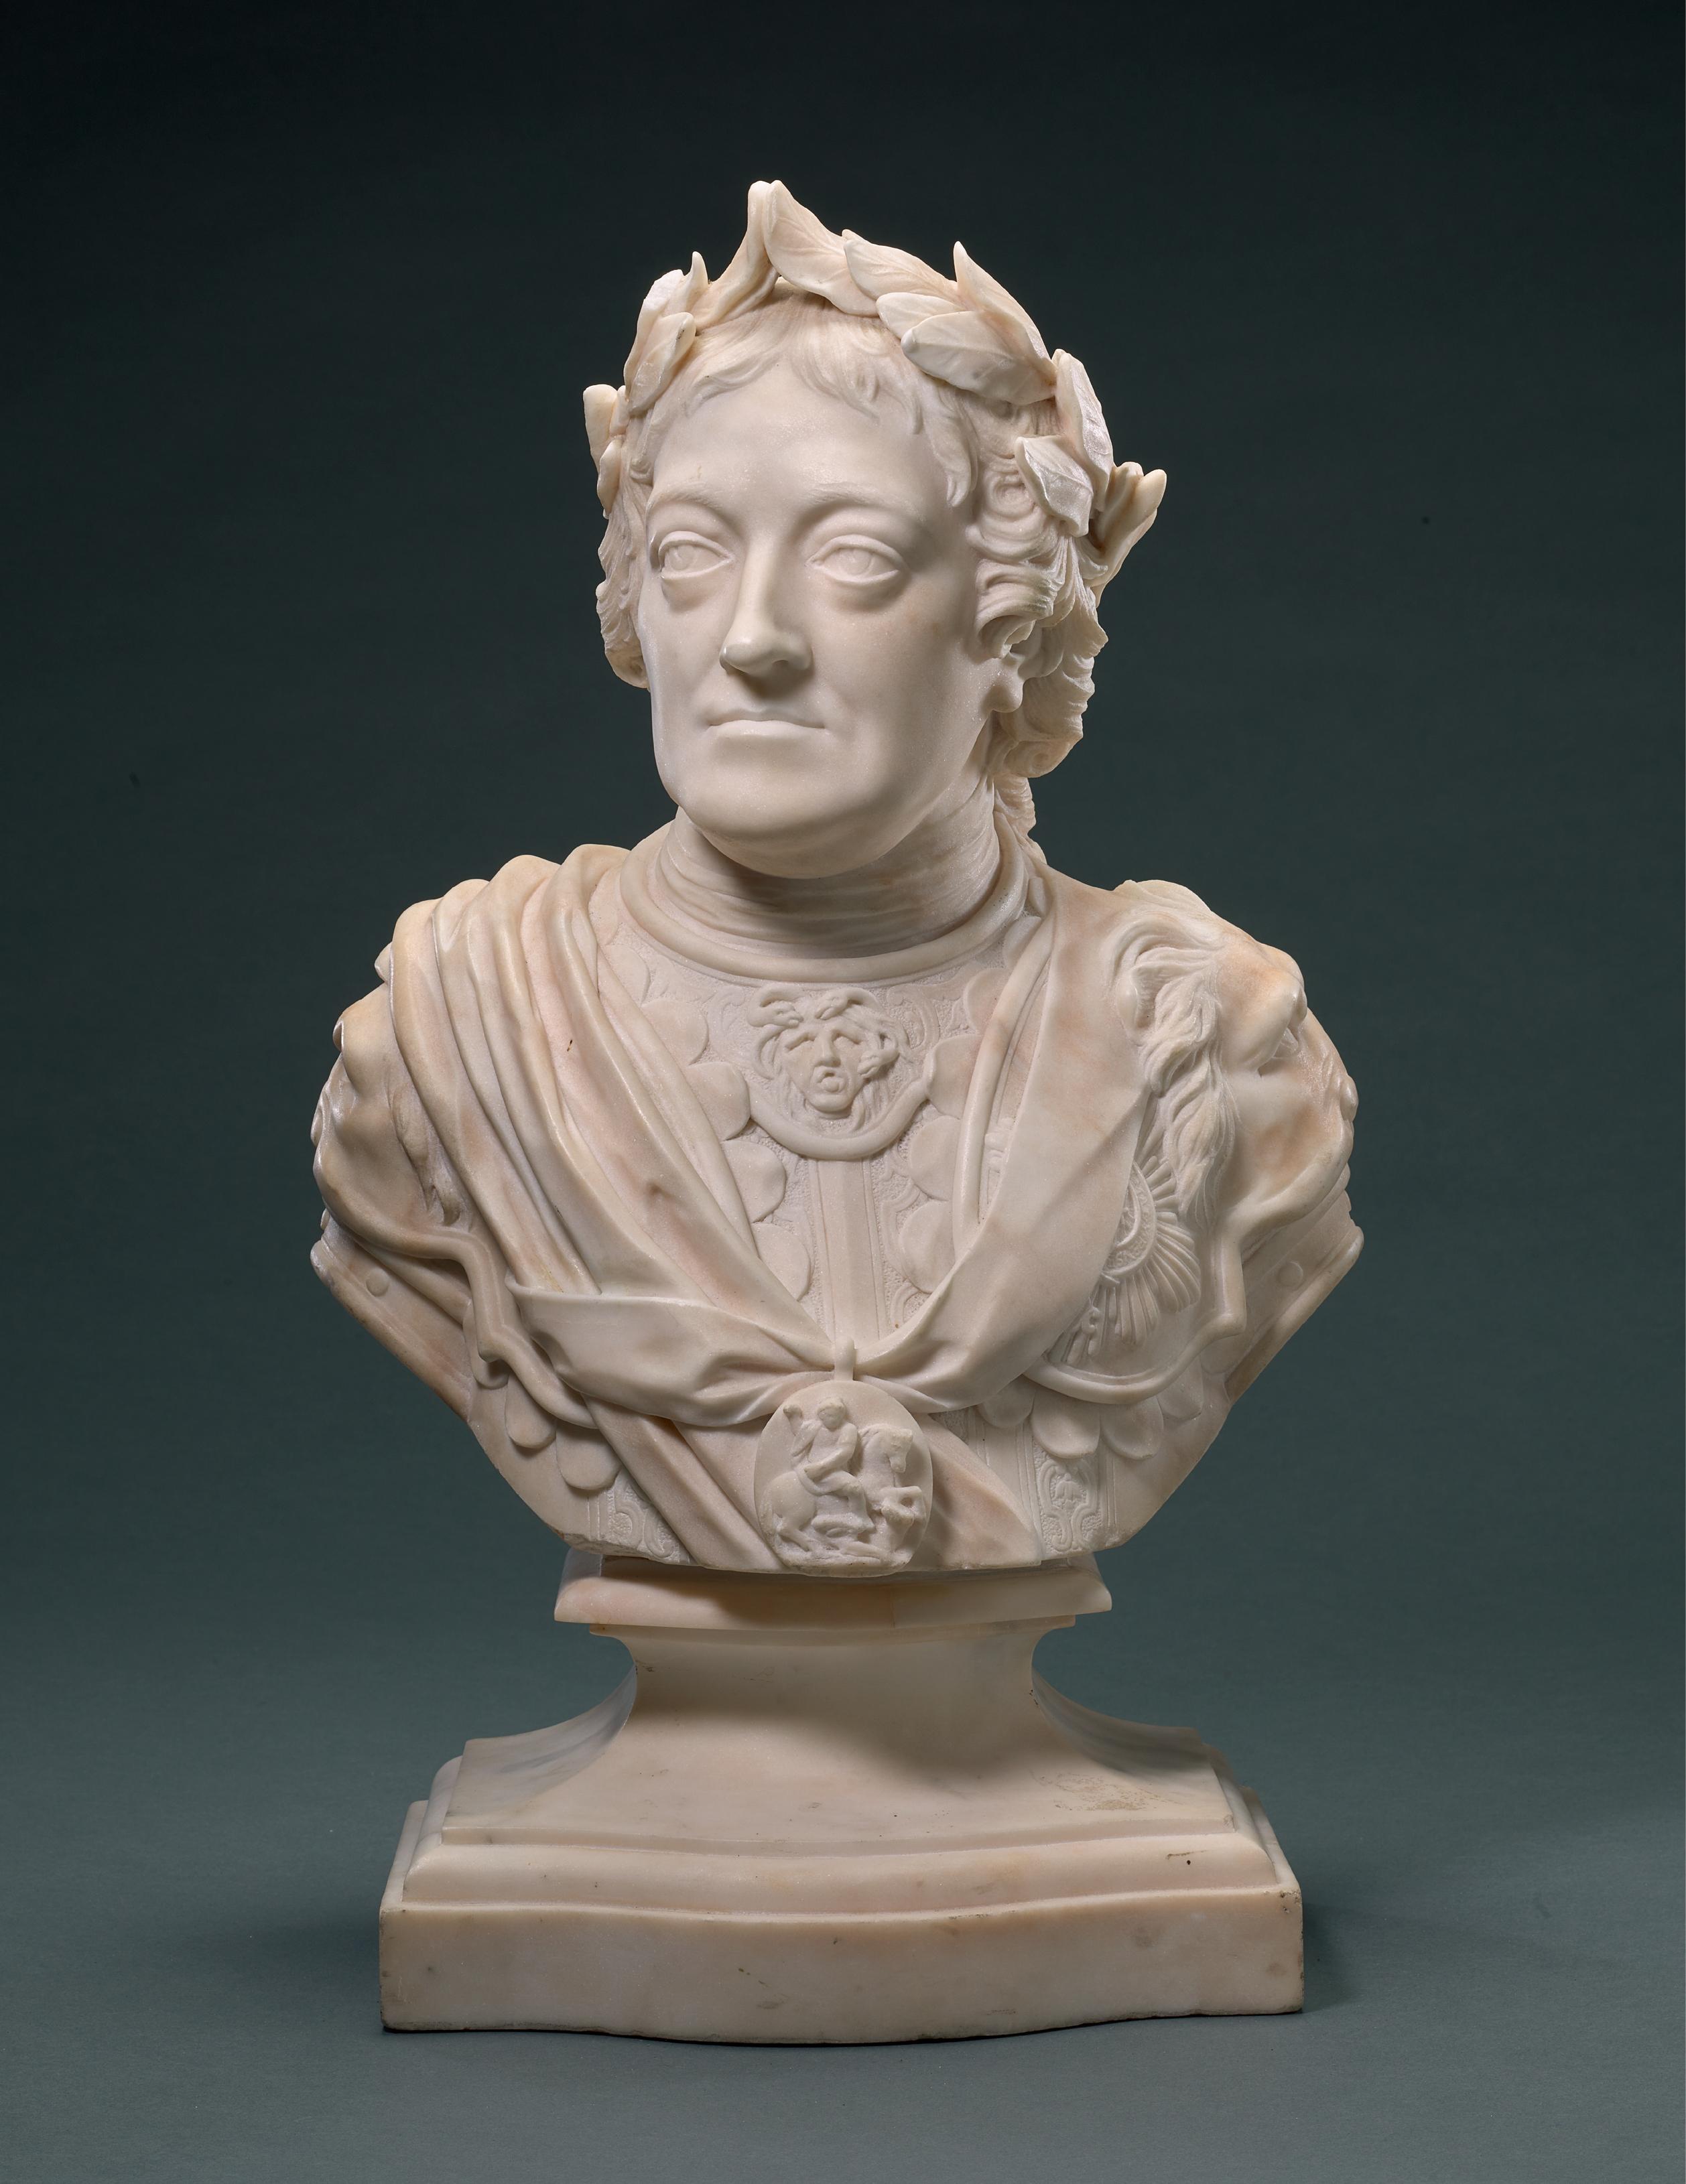 WORKSHOP OF MICHAEL RYSBRACK (1694-1770), BRITISH, 18TH CENTURY | BUST OF KING GEORGE II (1638-1760)